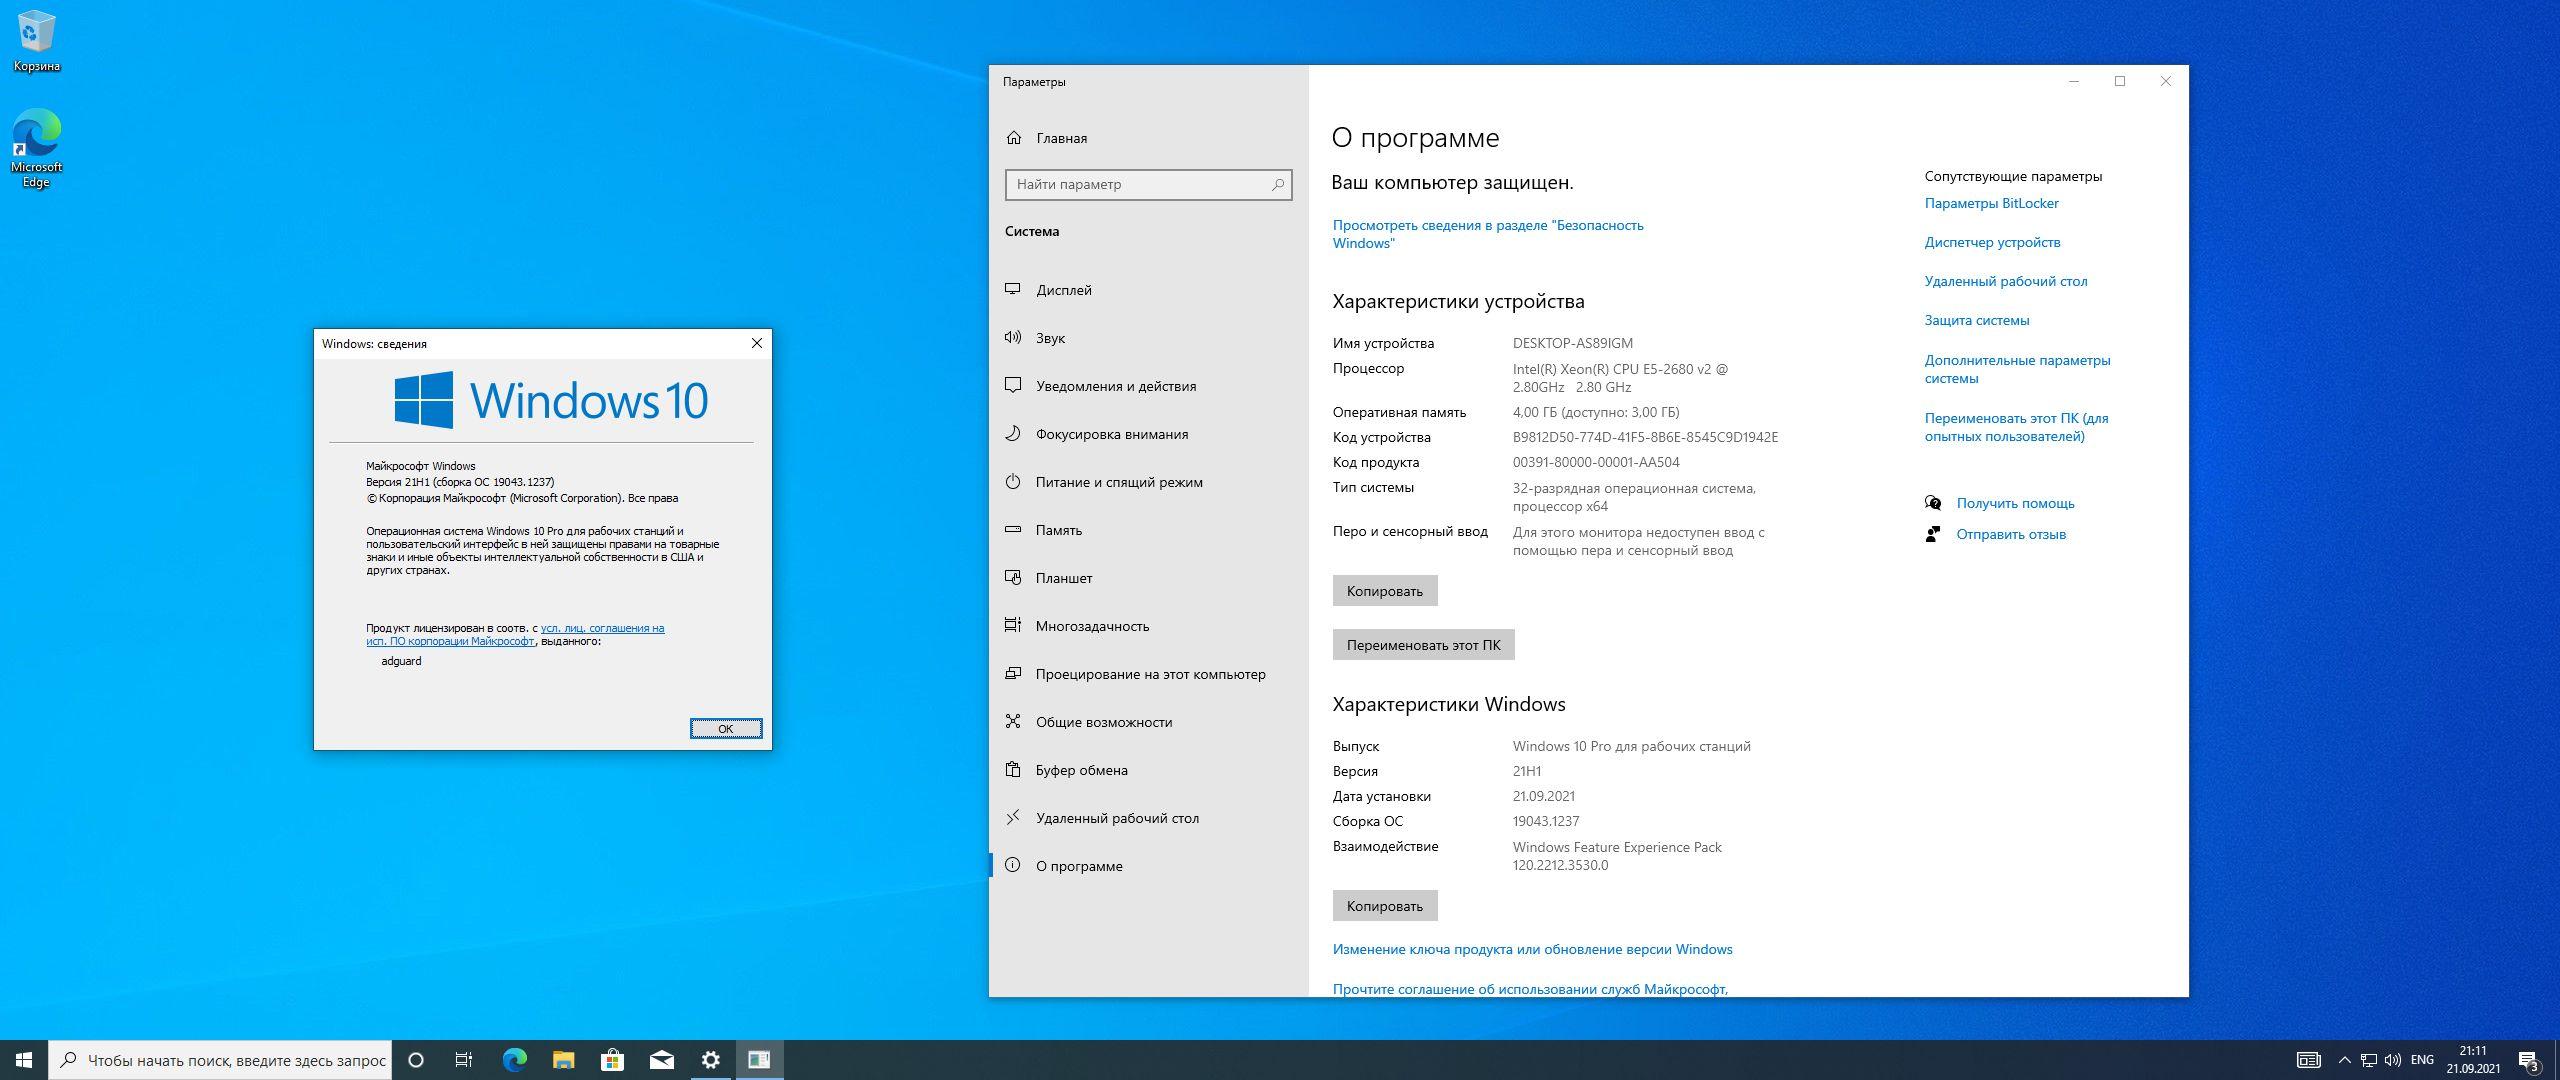 Windows 10.0.19043.1237 Version 21H1 (Updated September 2021) - Оригинальные образы от Microsoft MSDN